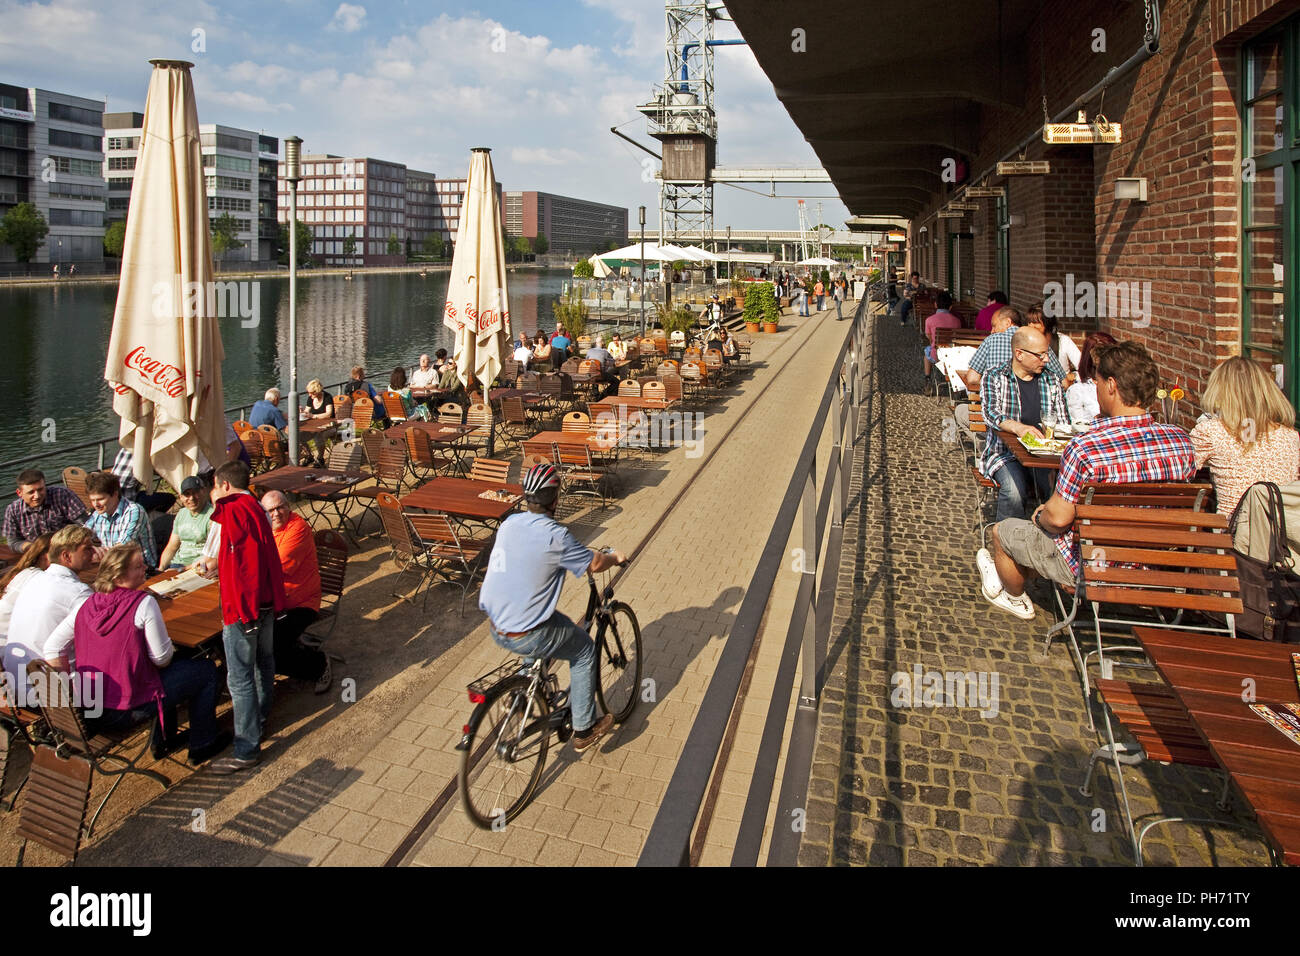 People, gastronomy, Duisburg Inner Harbour, German - Stock Image